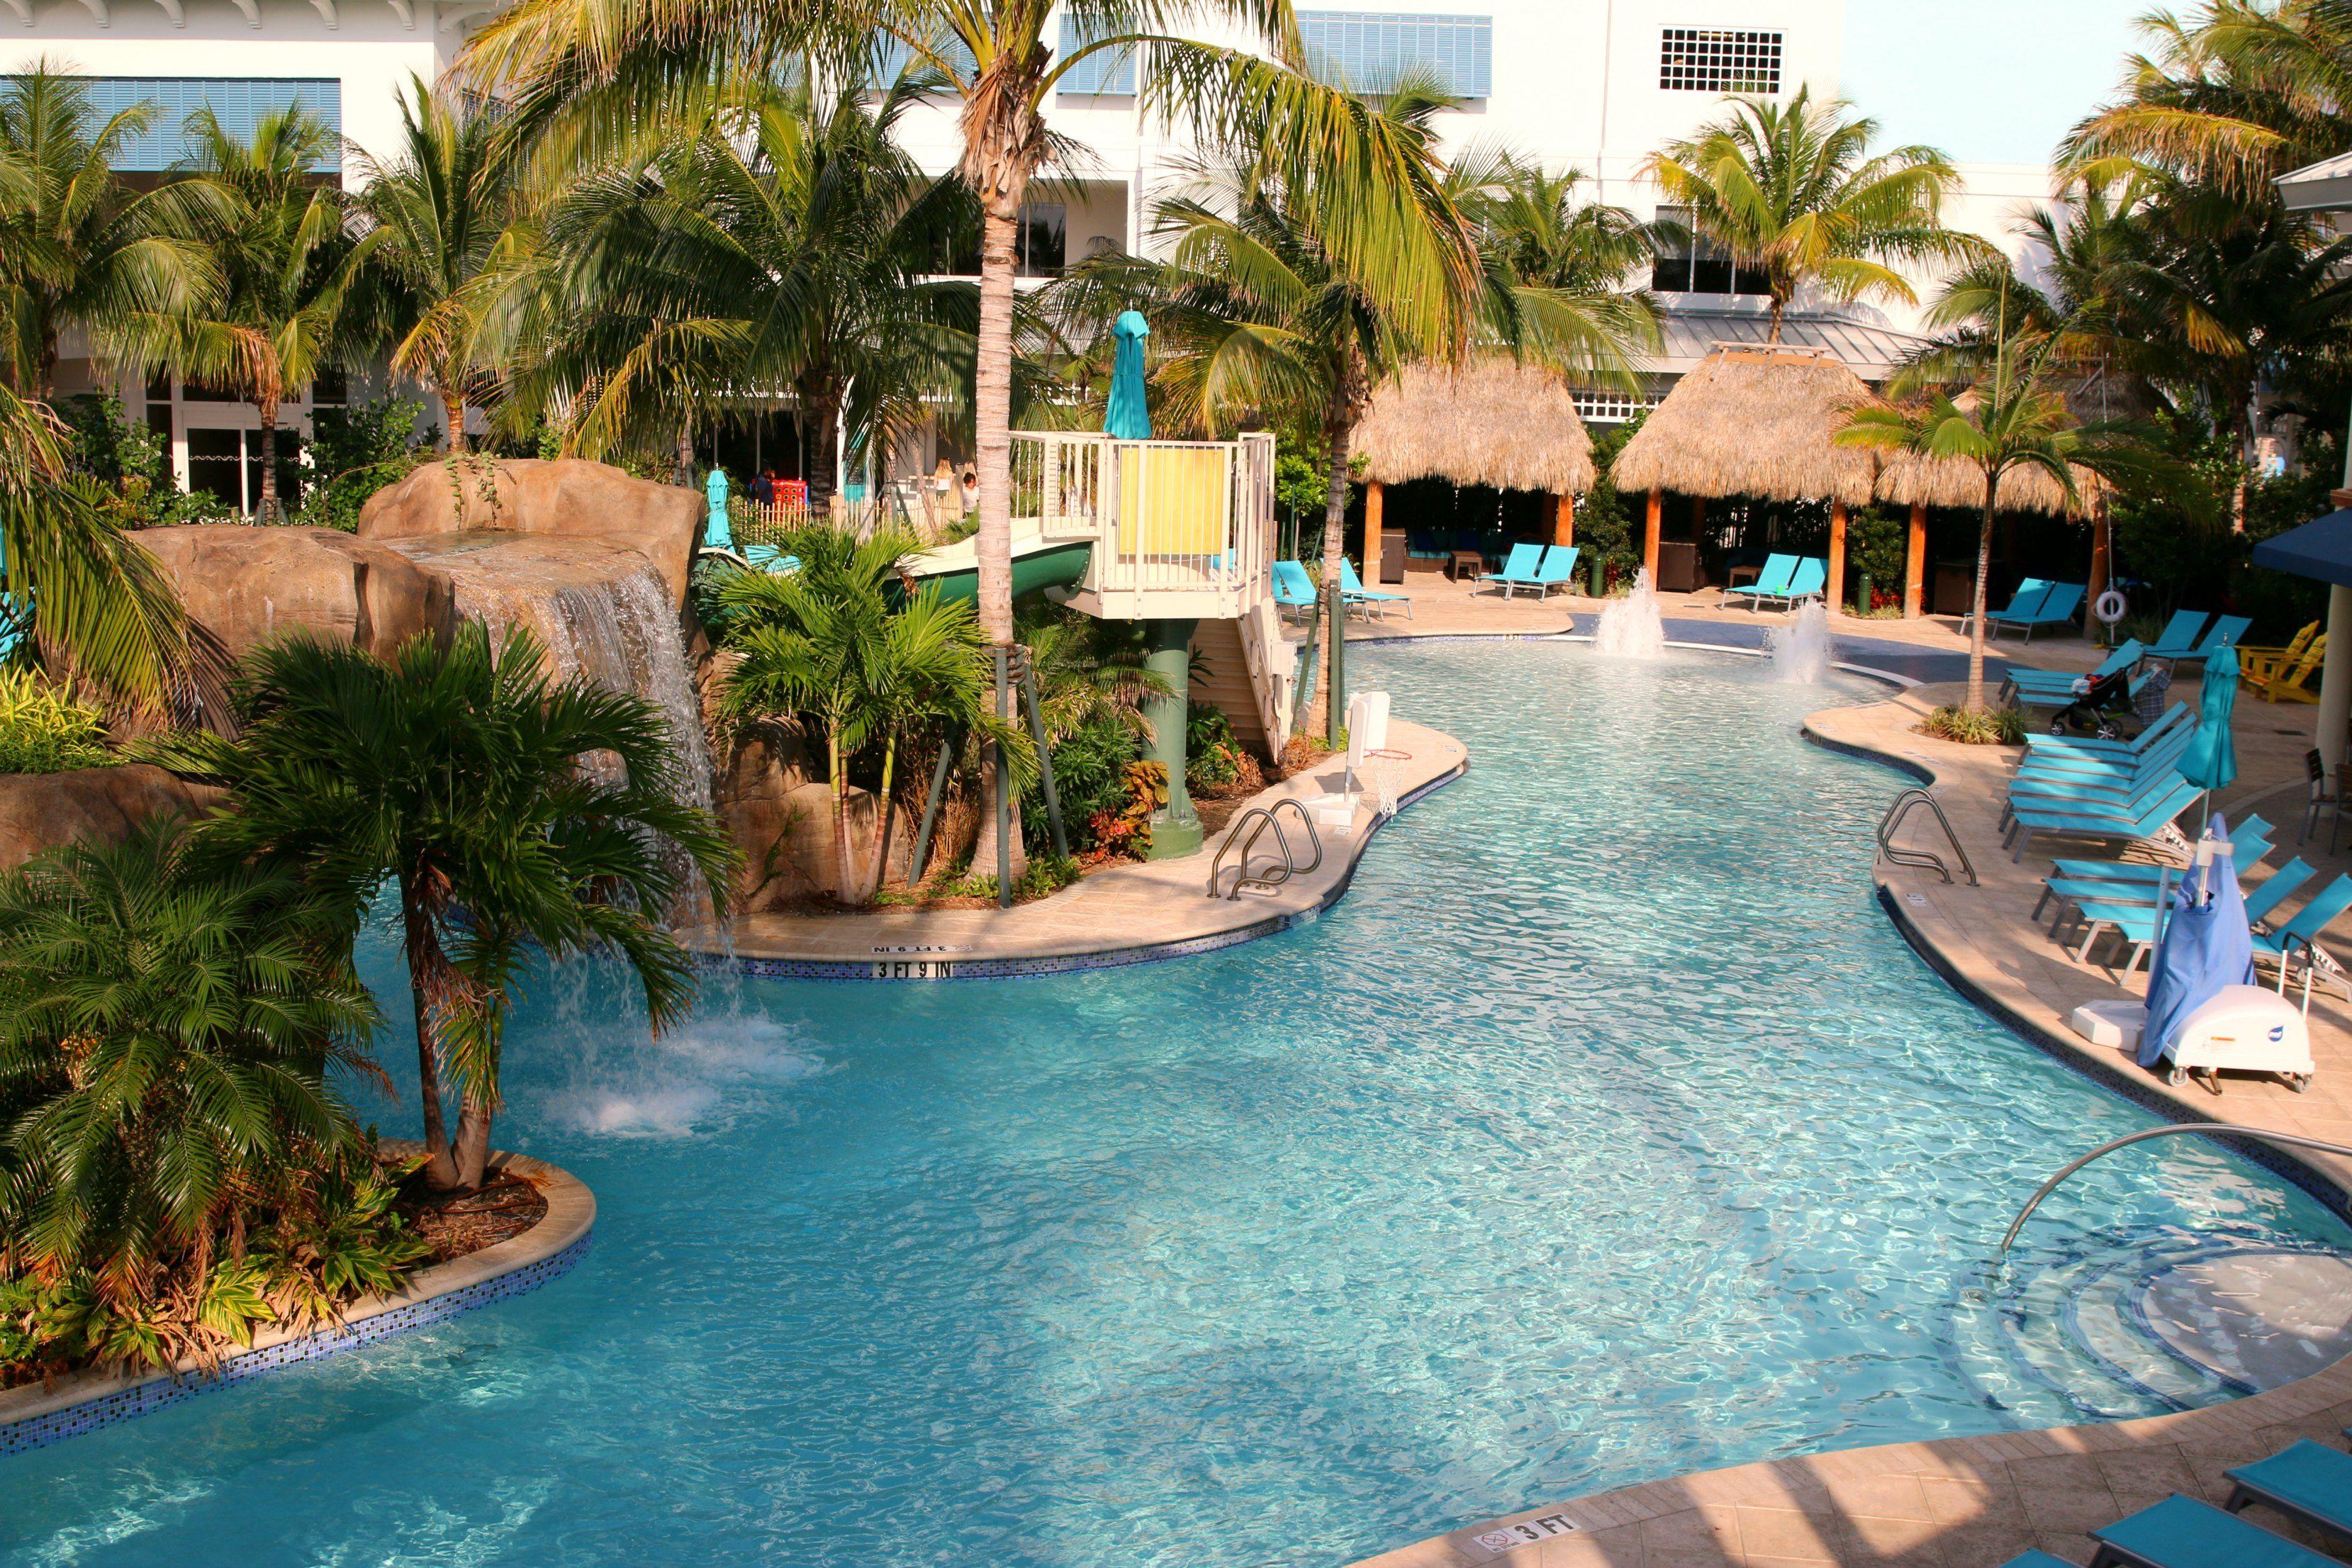 Margaritaville Beach Resort Hollywood Florida Review Hollywood Beach Hotels Hollywood Beach Florida Florida Hotels